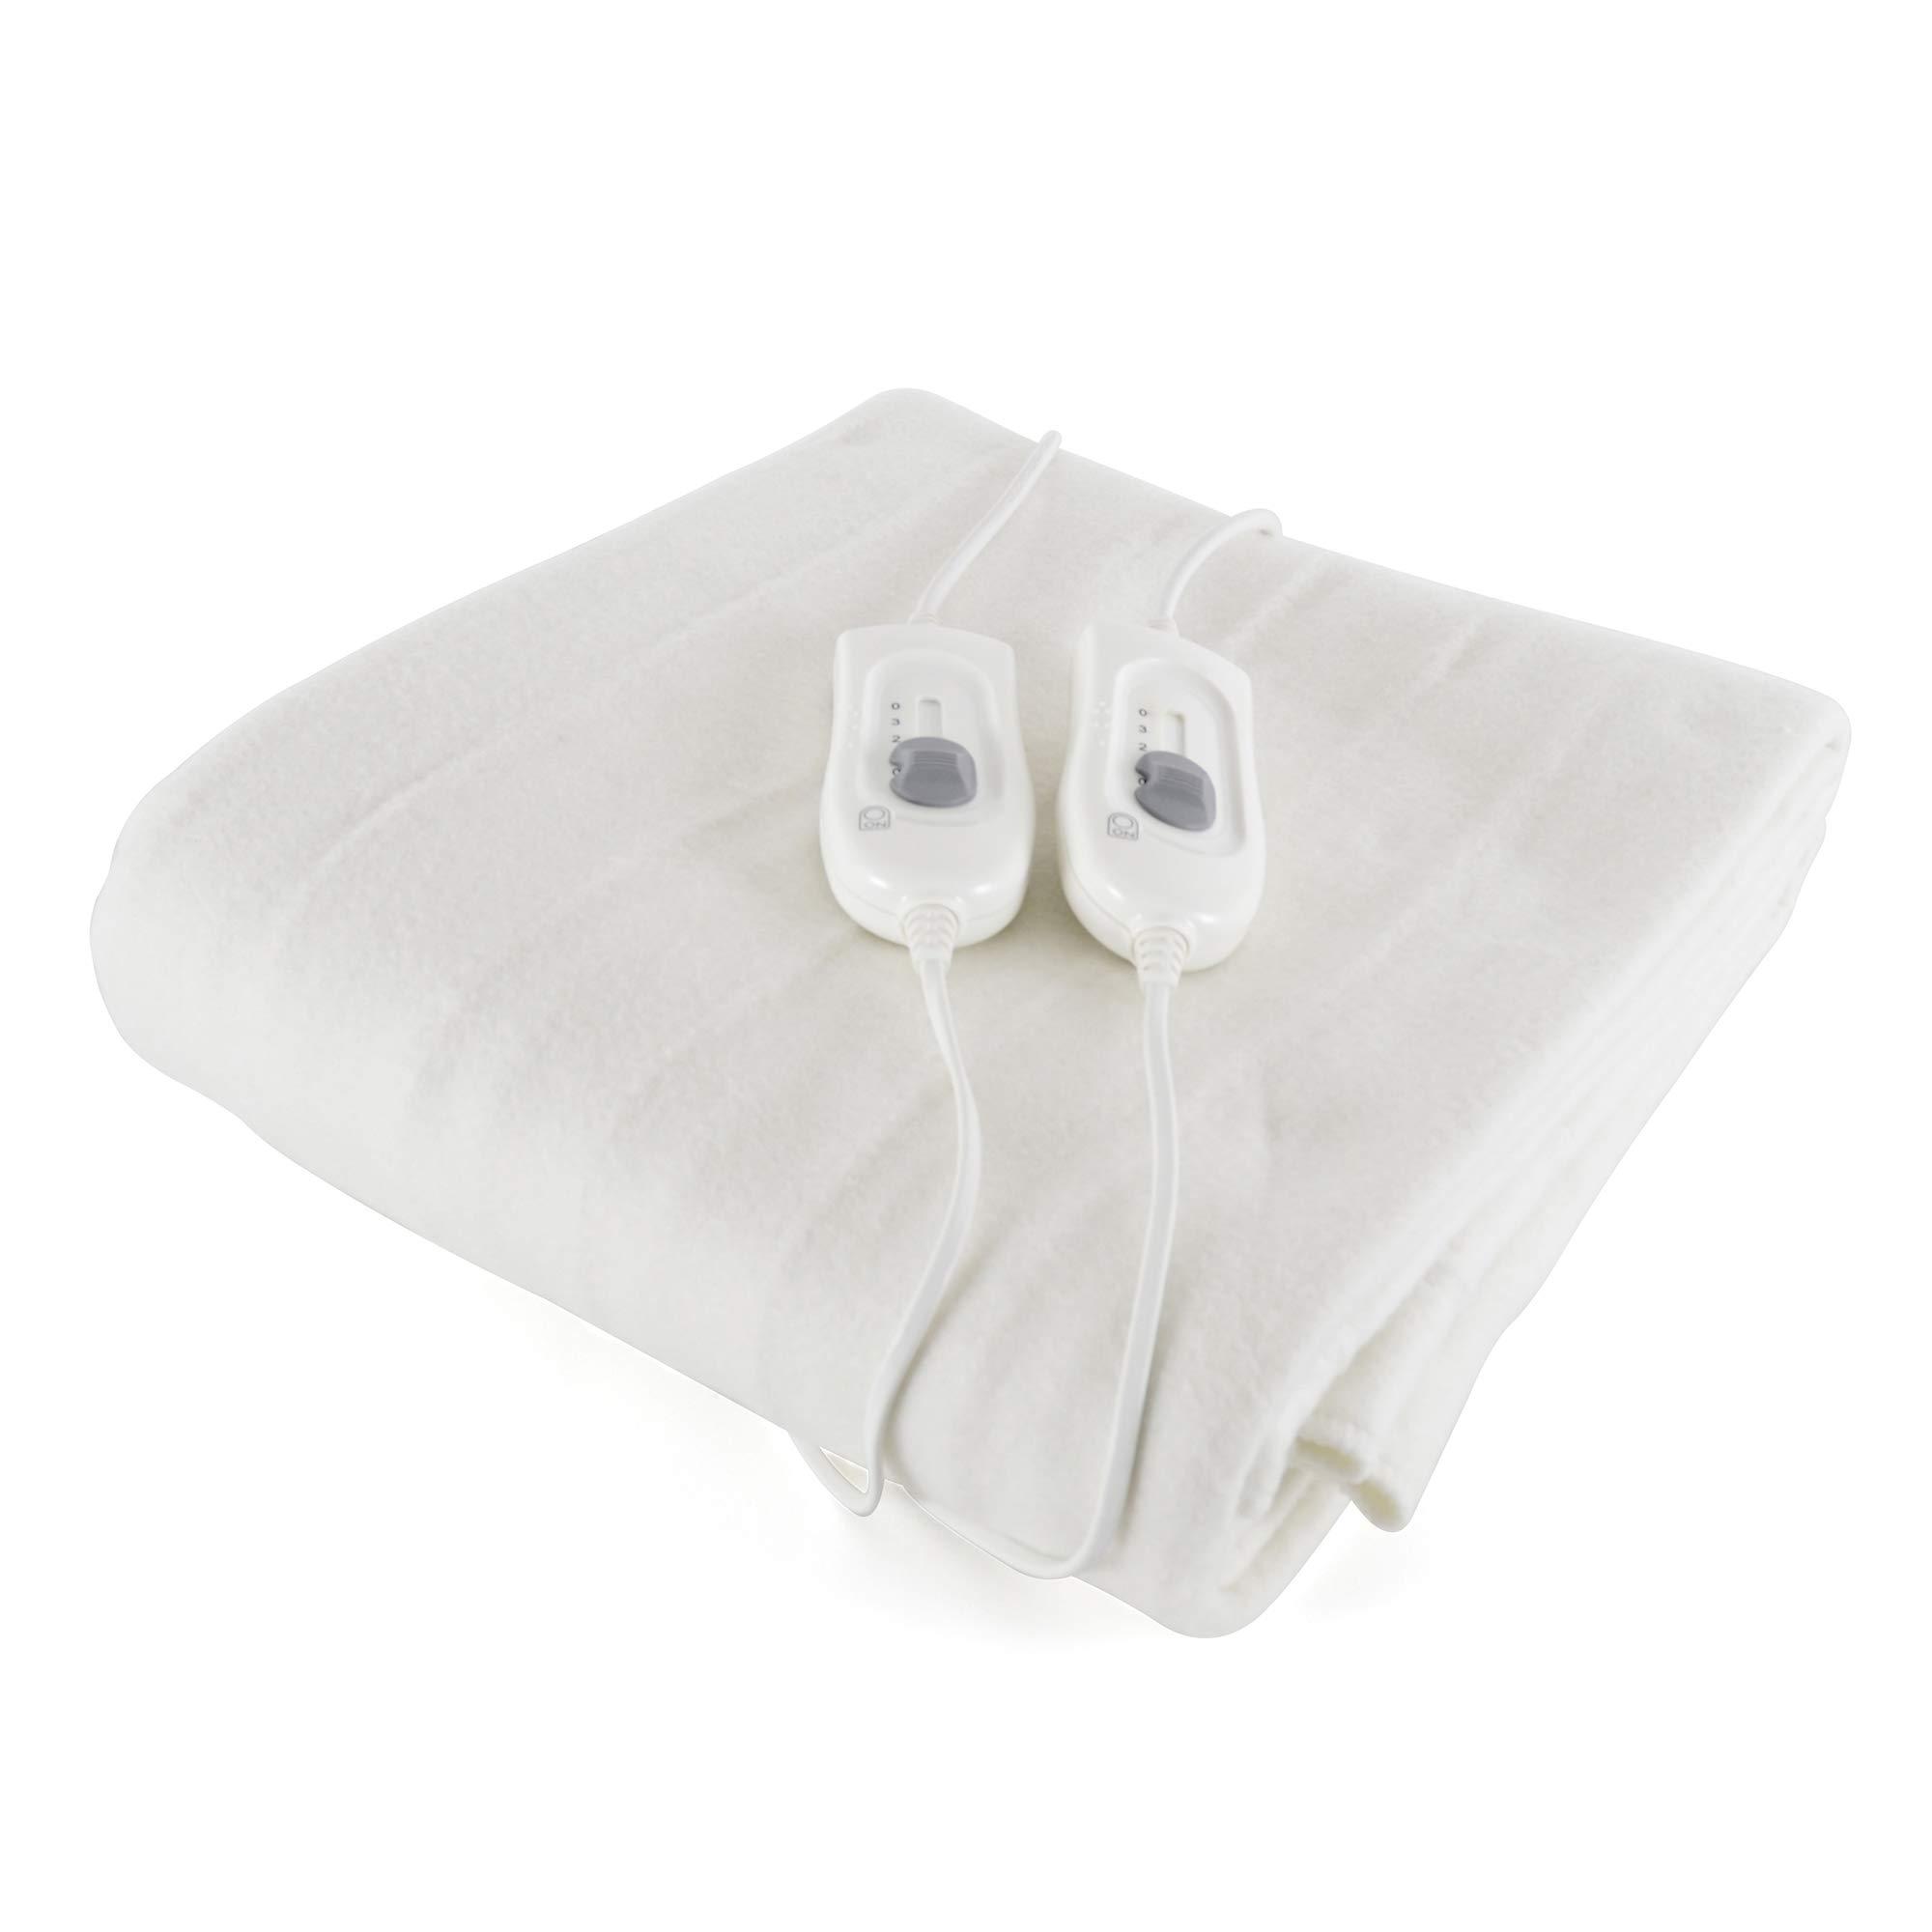 Comfort Heat Control Washable Electric Blanket 3 Heat Settings Double Benross